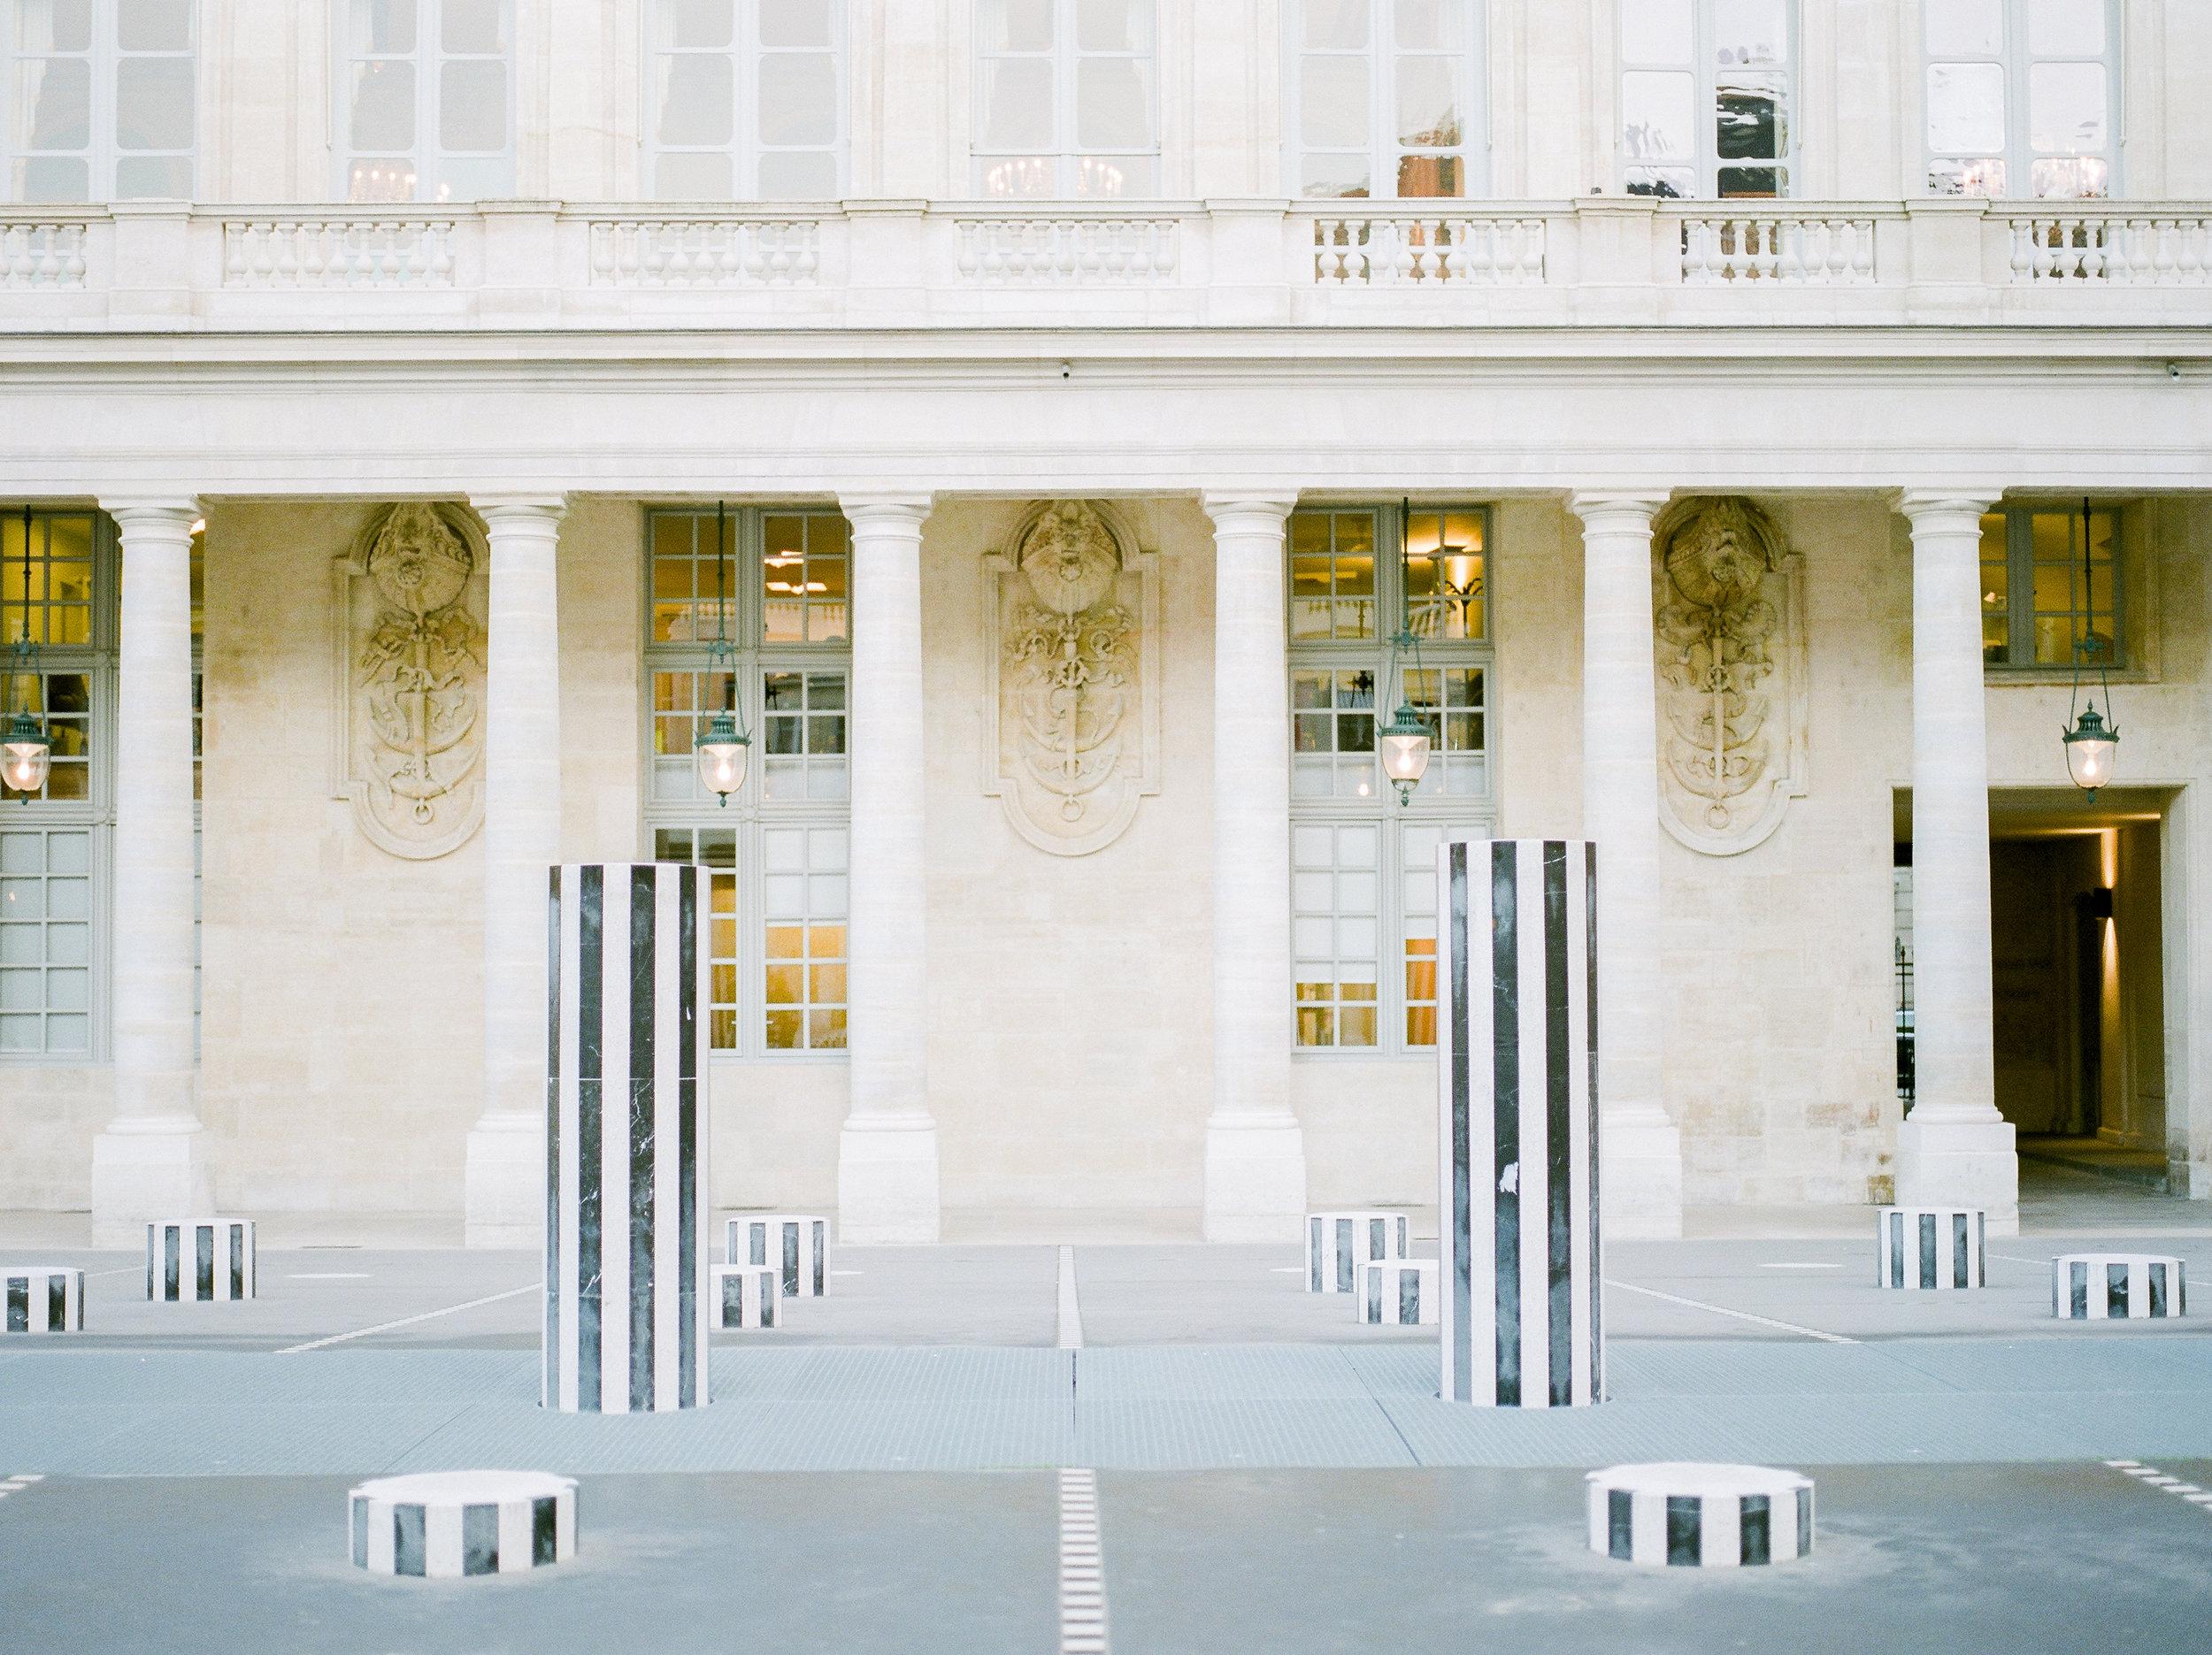 paris-lifestyle-travel-photographer-136.jpg